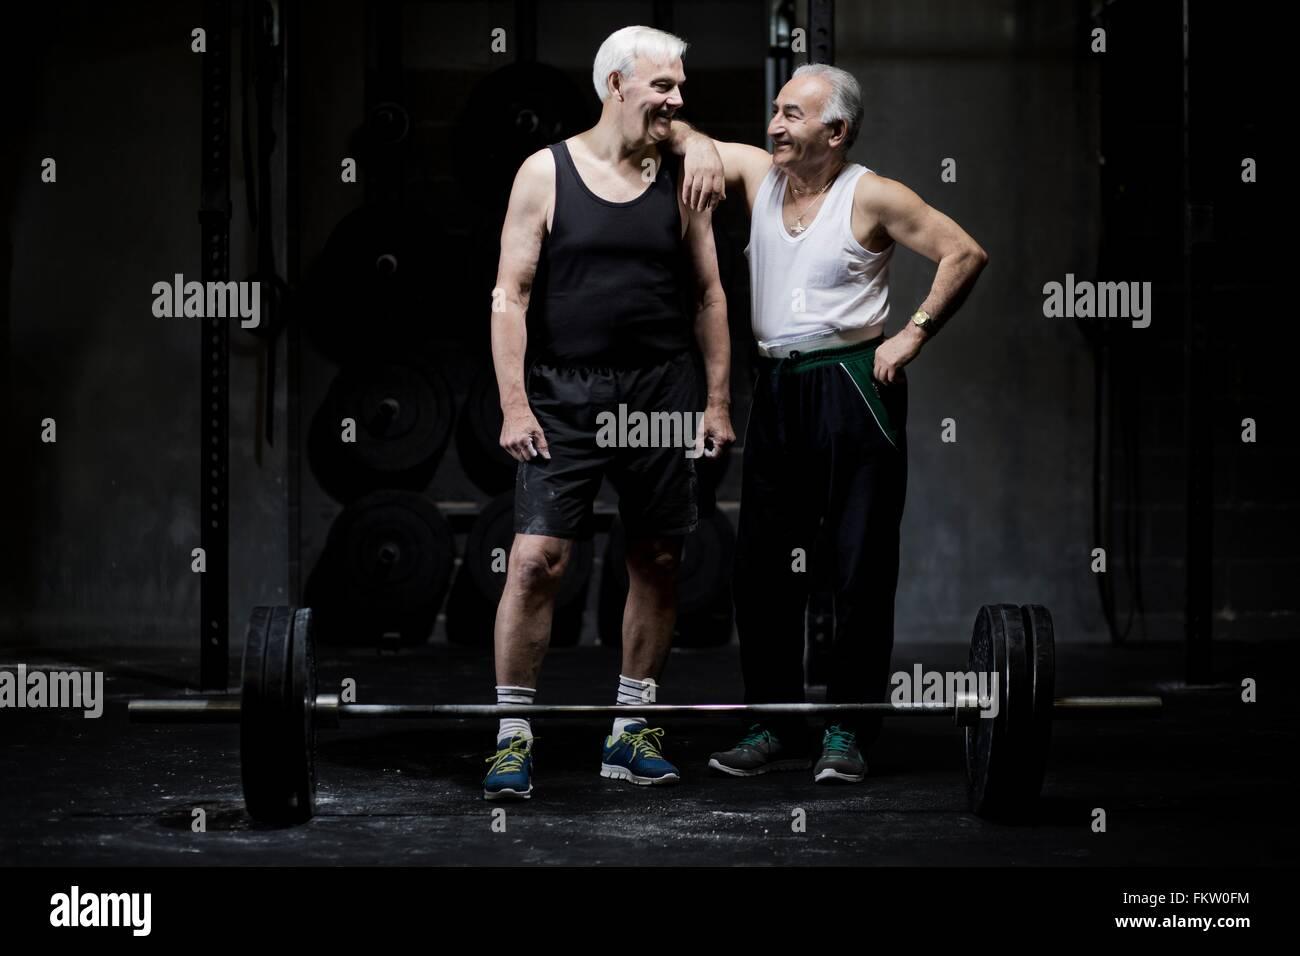 Senior men chatting in dark gym - Stock Image